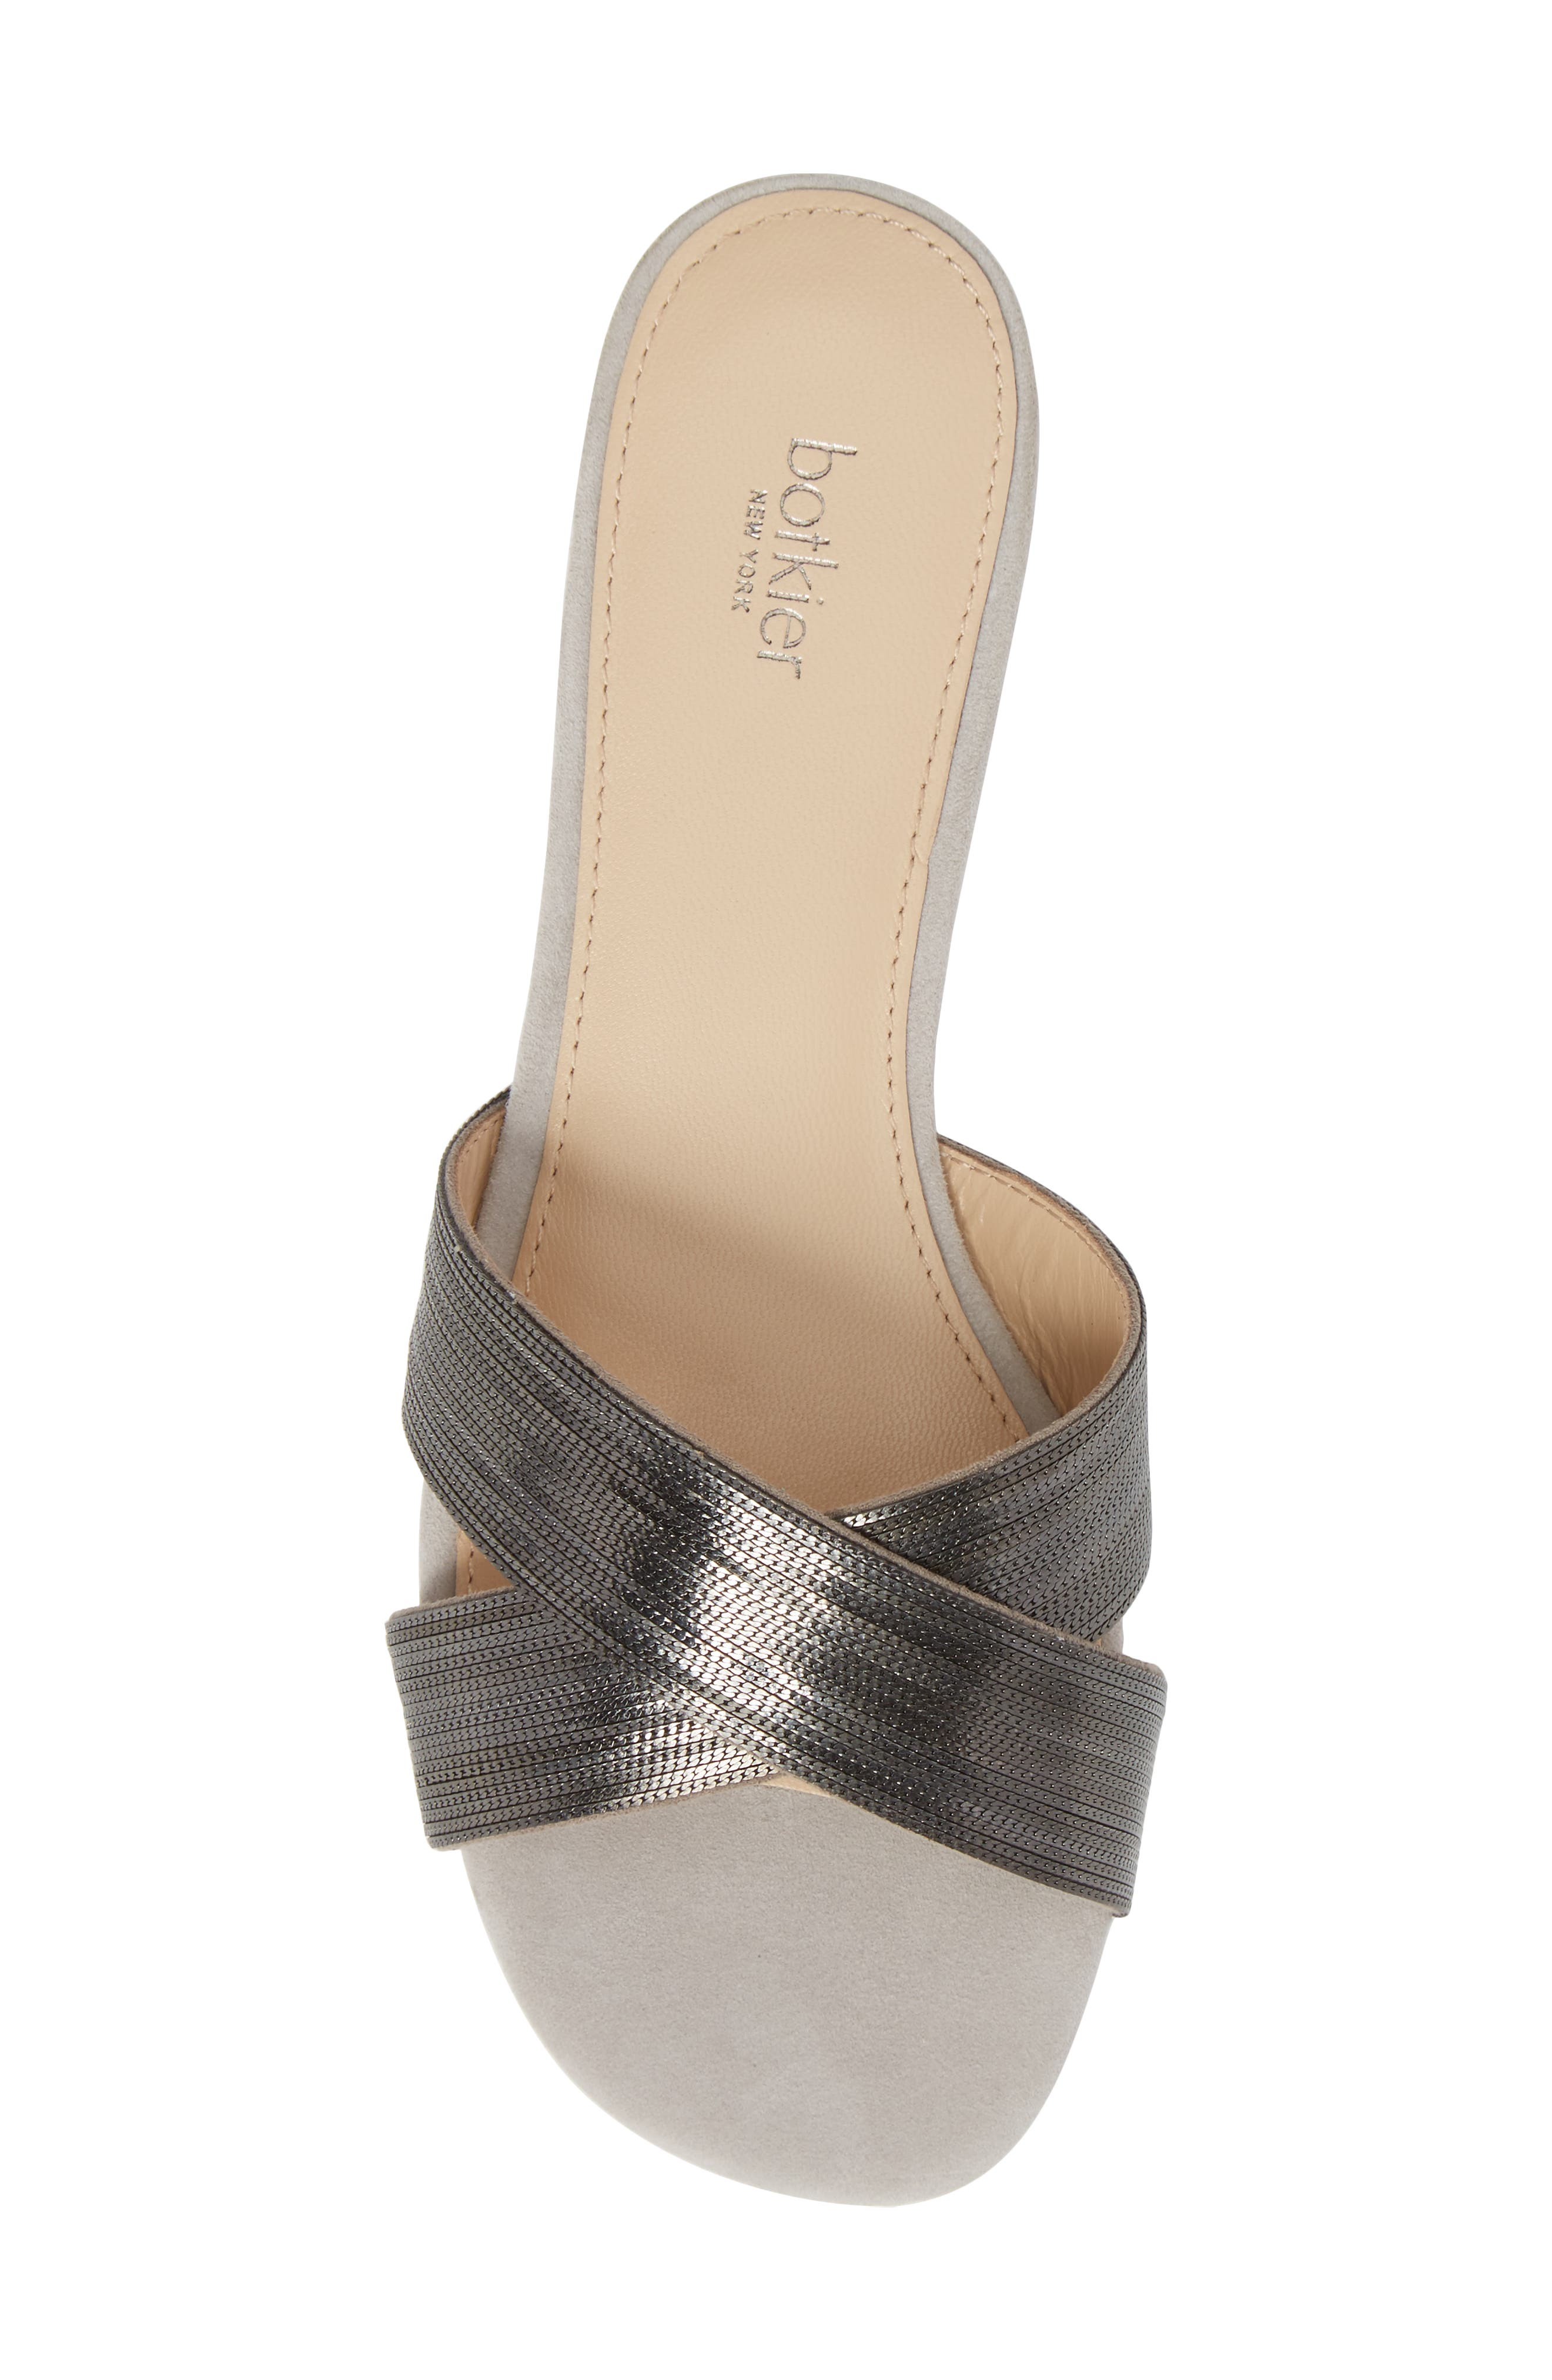 Millie Cross Strap Slide Sandal,                             Alternate thumbnail 5, color,                             Clay/ Gunmetal Suede